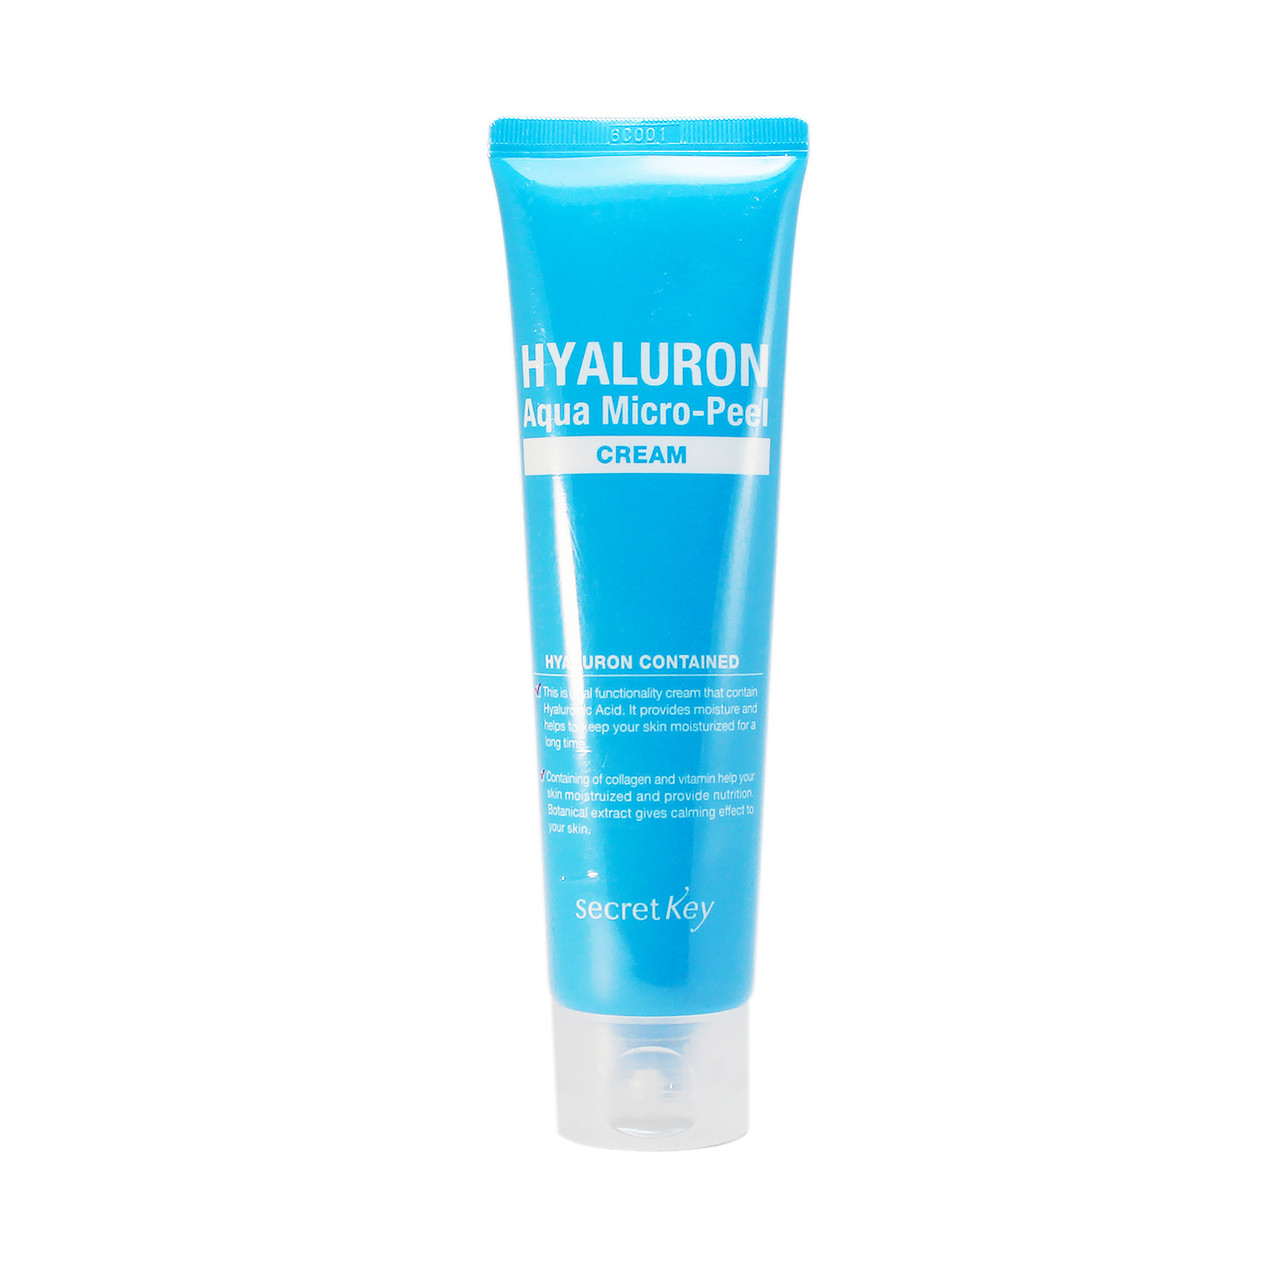 Secret Key Увлажняющий Гиалуроновый Крем для лица Hyaluron Aqua Micro Peel Cream  70гр.